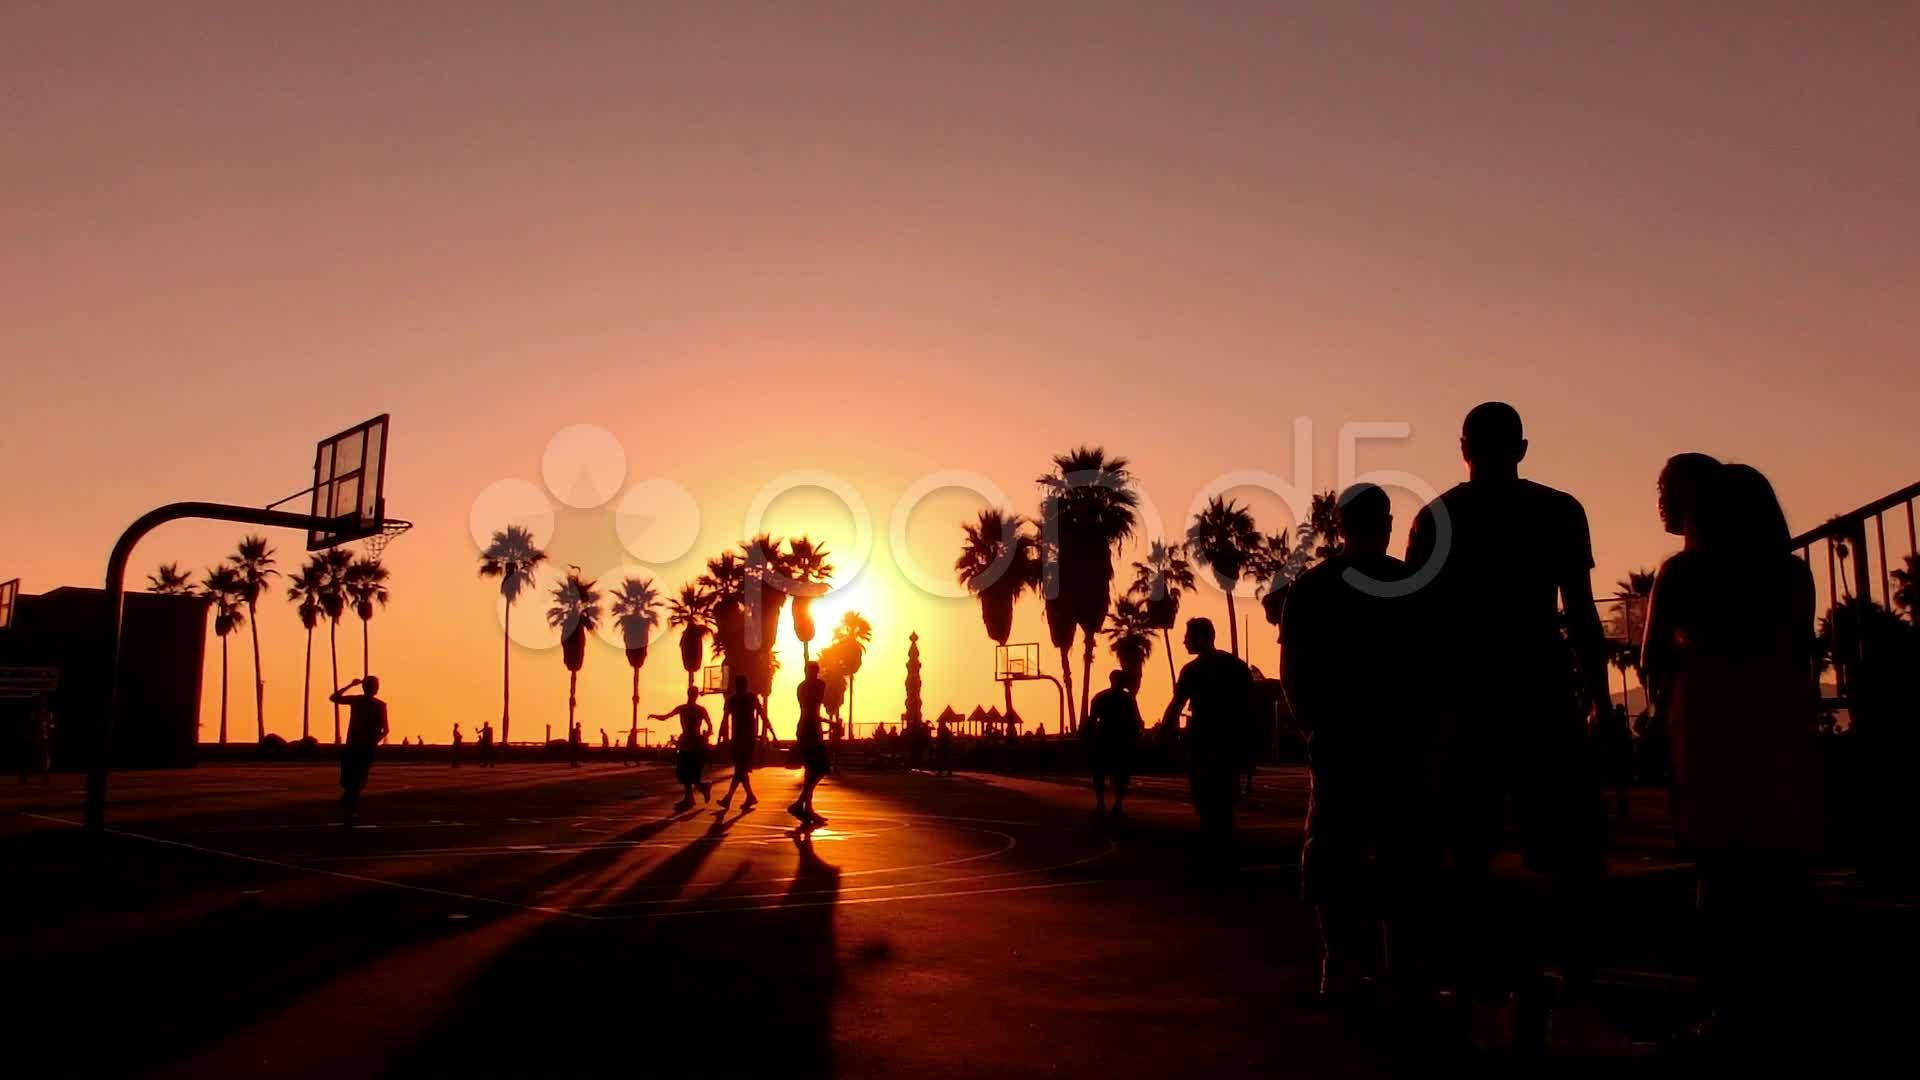 60 Venice Beach Sunset Wallpapers   Download at WallpaperBro 1920x1080